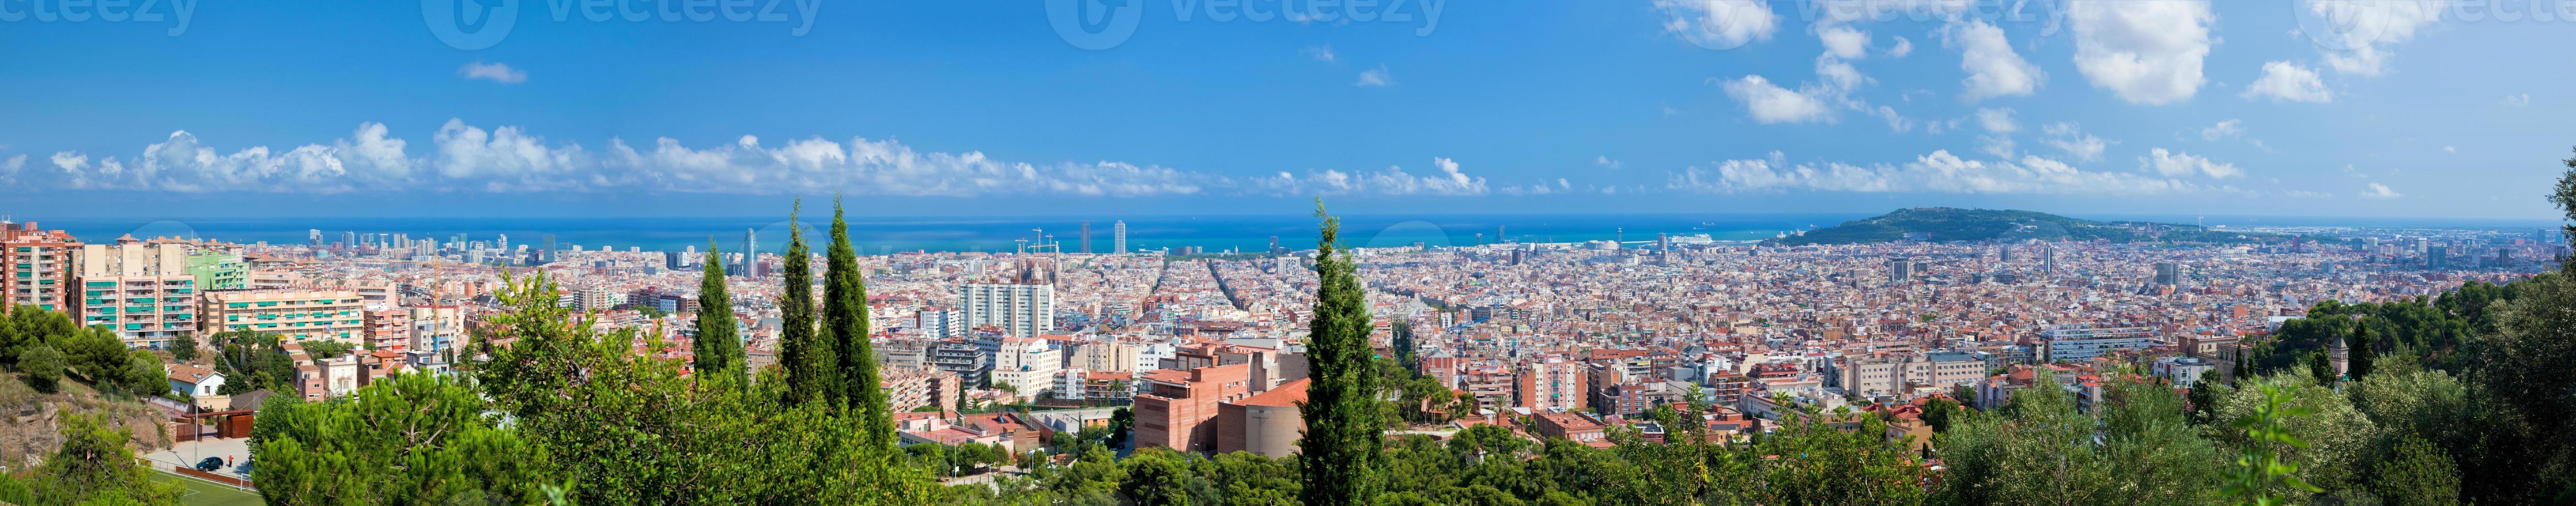 Barcelona, Spanje skyline panorama foto